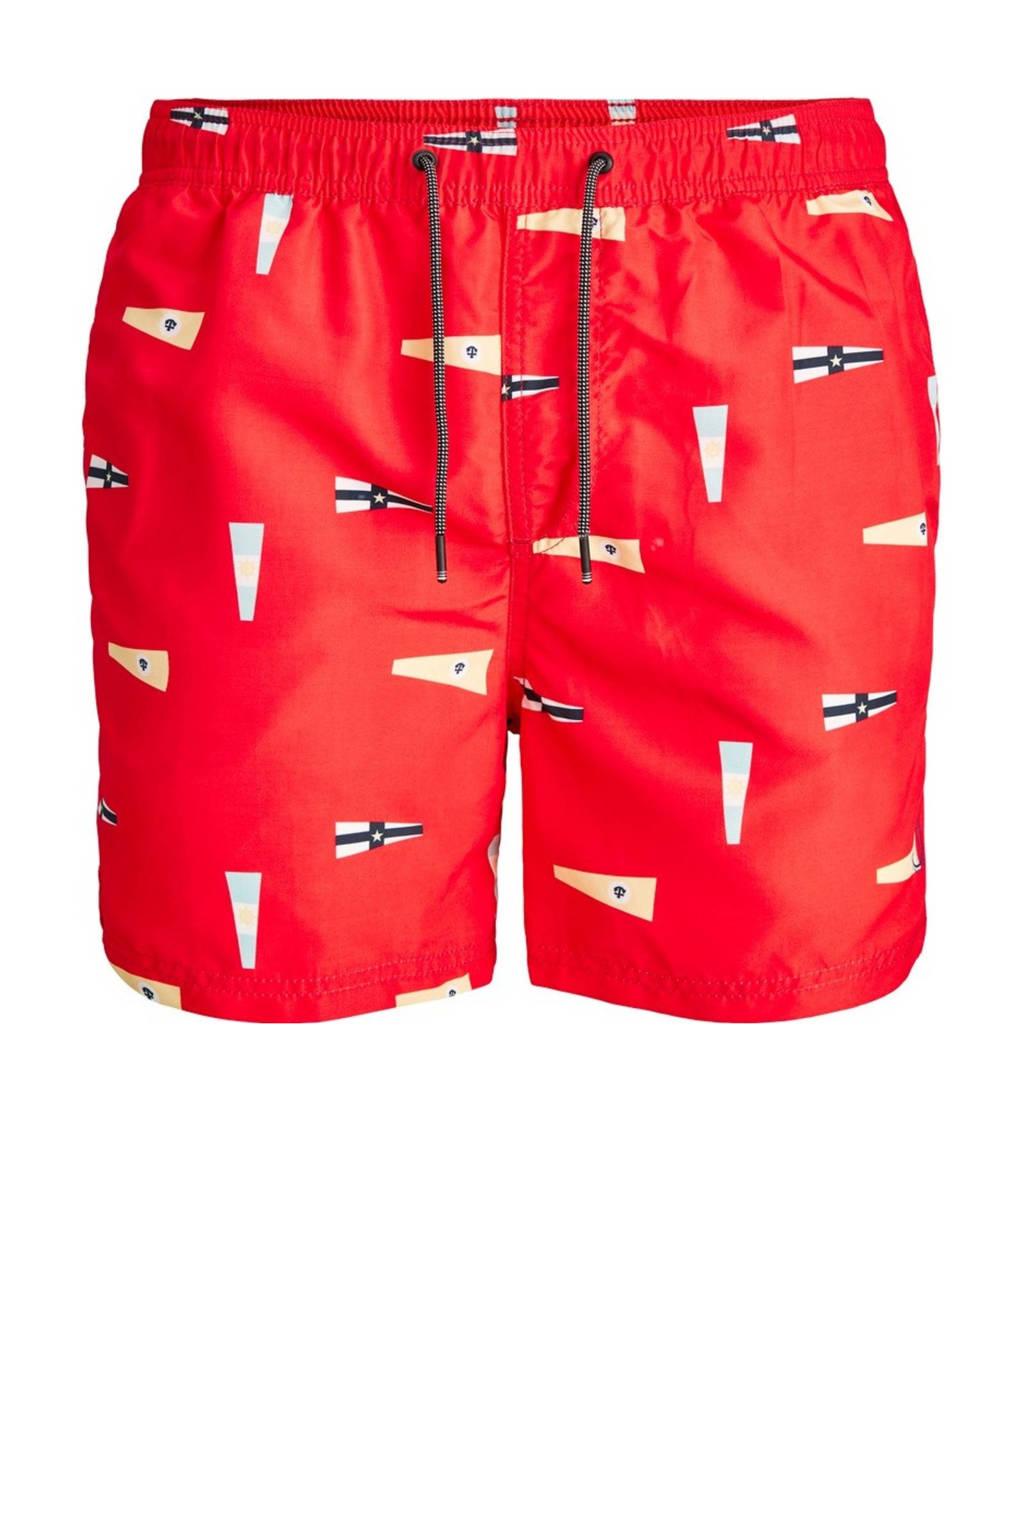 JACK & JONES JEANS INTELLIGENCE zwemshort Bali met all over print rood, Rood